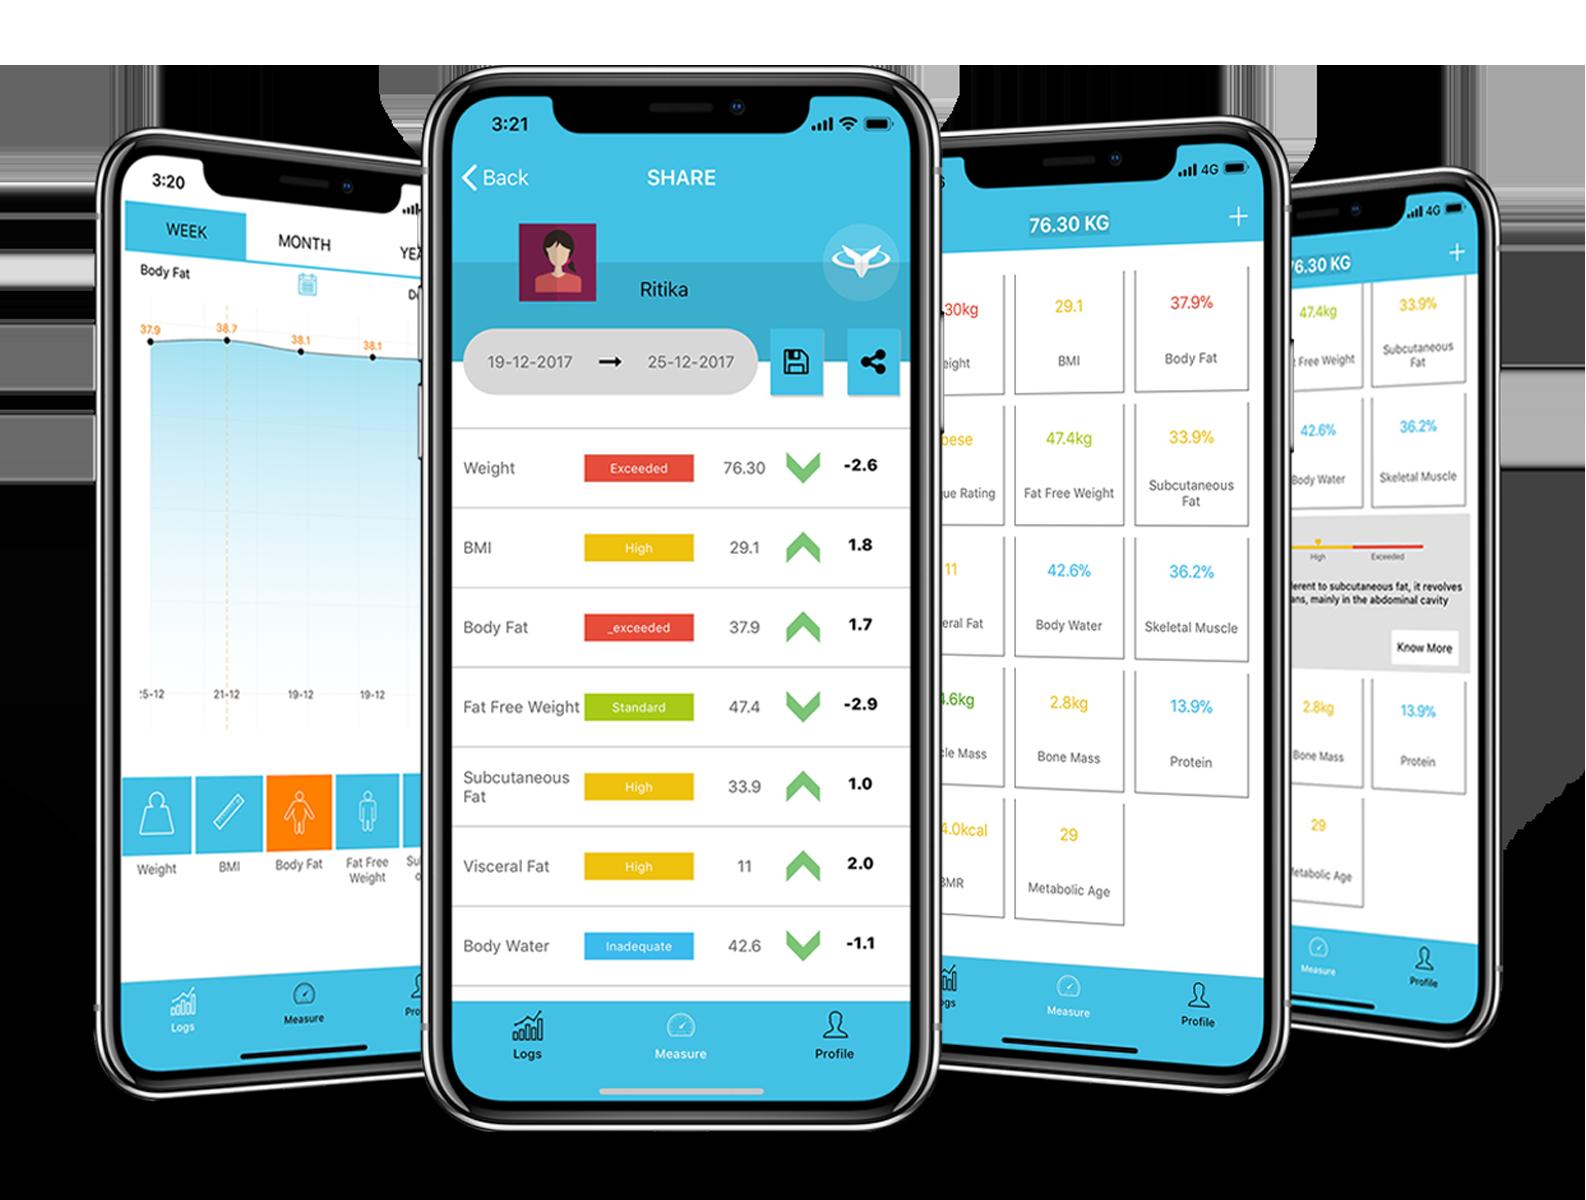 Actofit smartscale iOS application